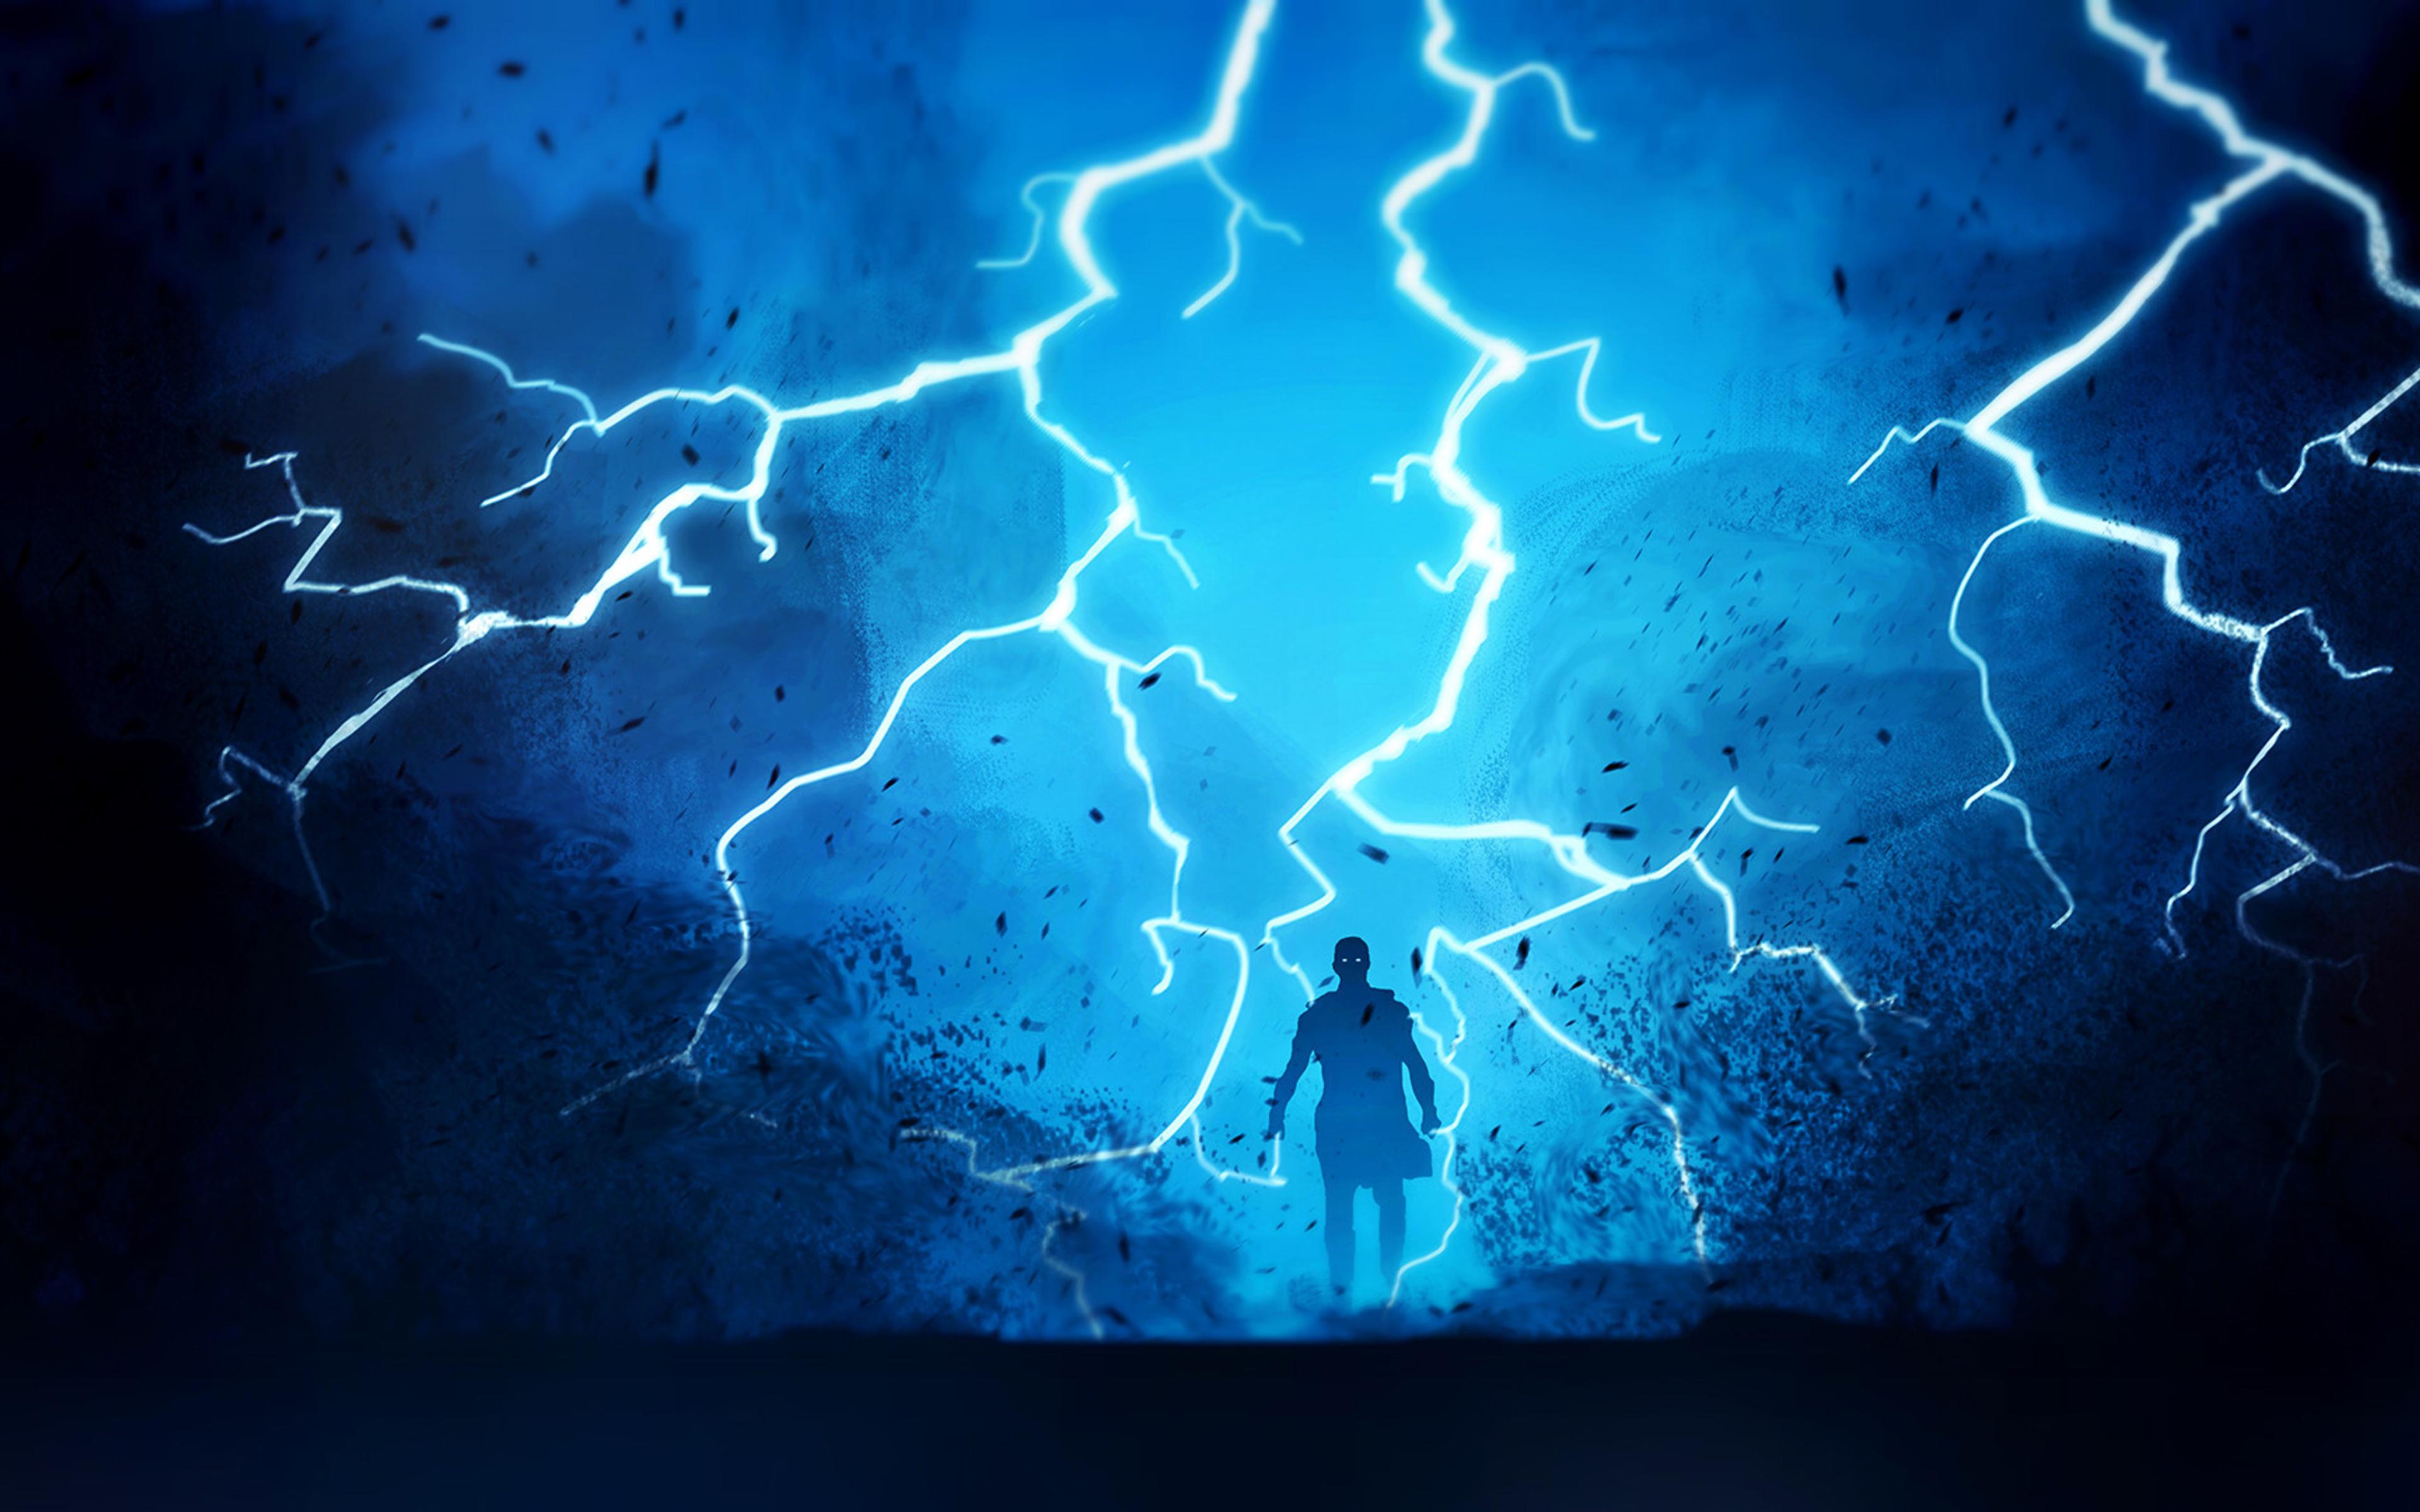 3840x2400 warrior fantasy lightning 4k hd 4k wallpapers images backgrounds photos and pictures - Lightning wallpaper 4k ...